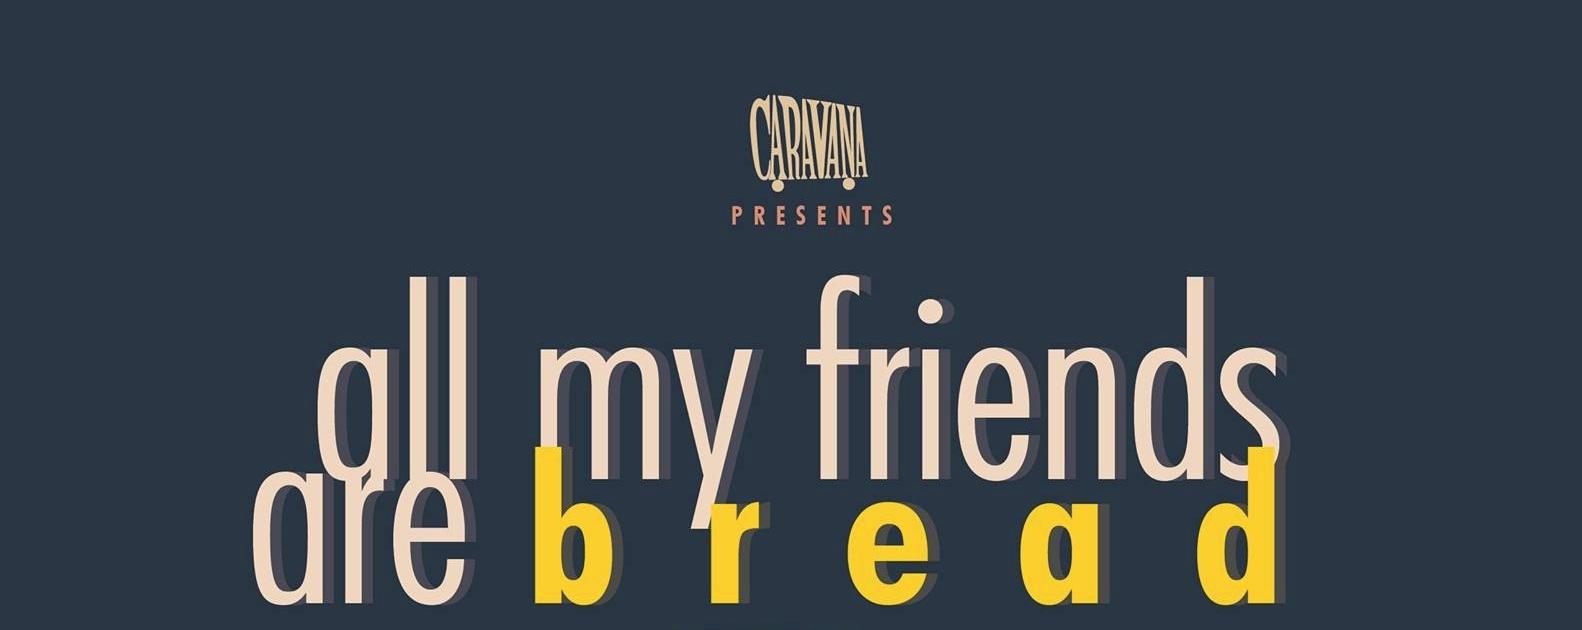 All my Friends are Bread | Caravana